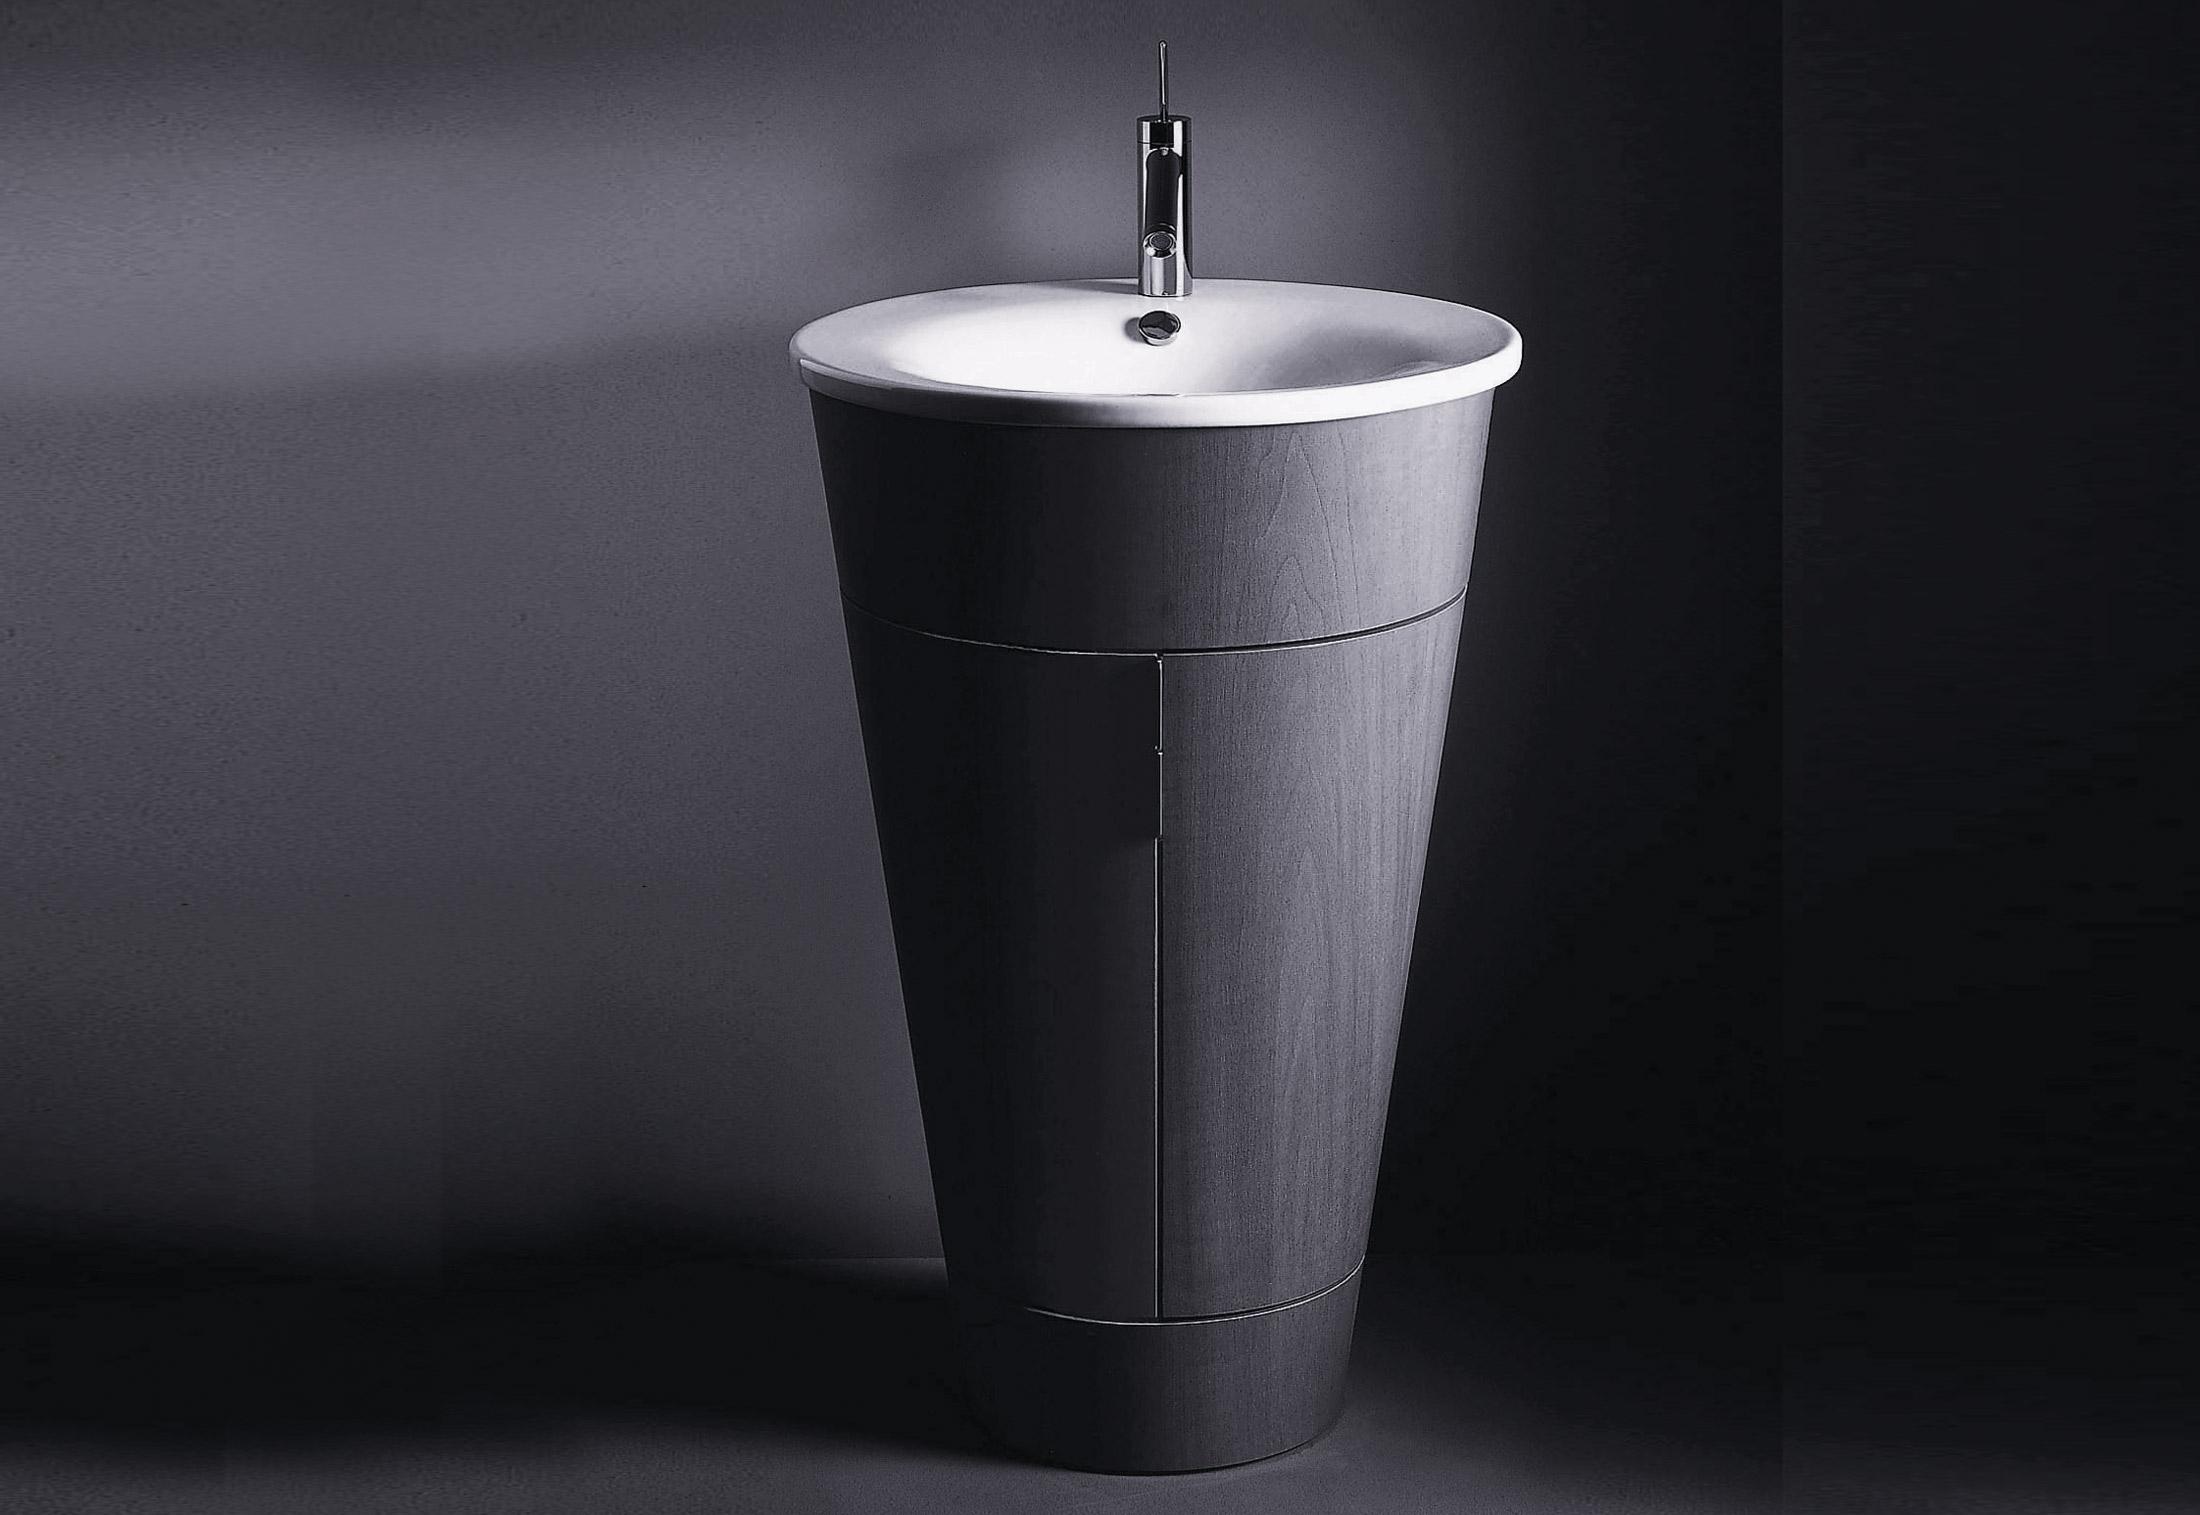 starck 1 furniture washbasin by duravit stylepark. Black Bedroom Furniture Sets. Home Design Ideas